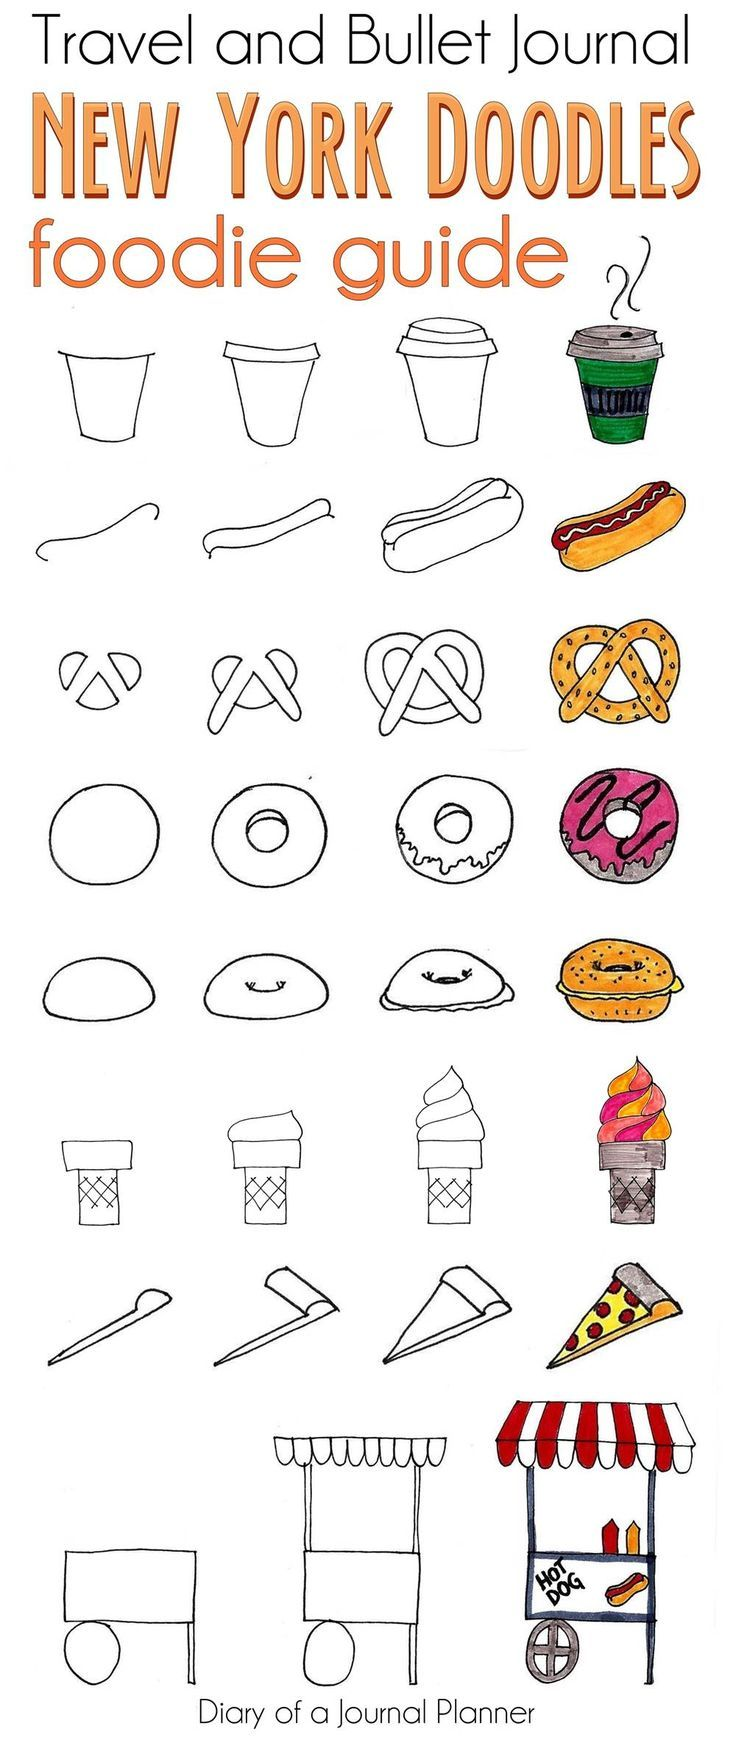 Food doodles of NY for travel journal or bullet journal. #doodles #illustration #drawings